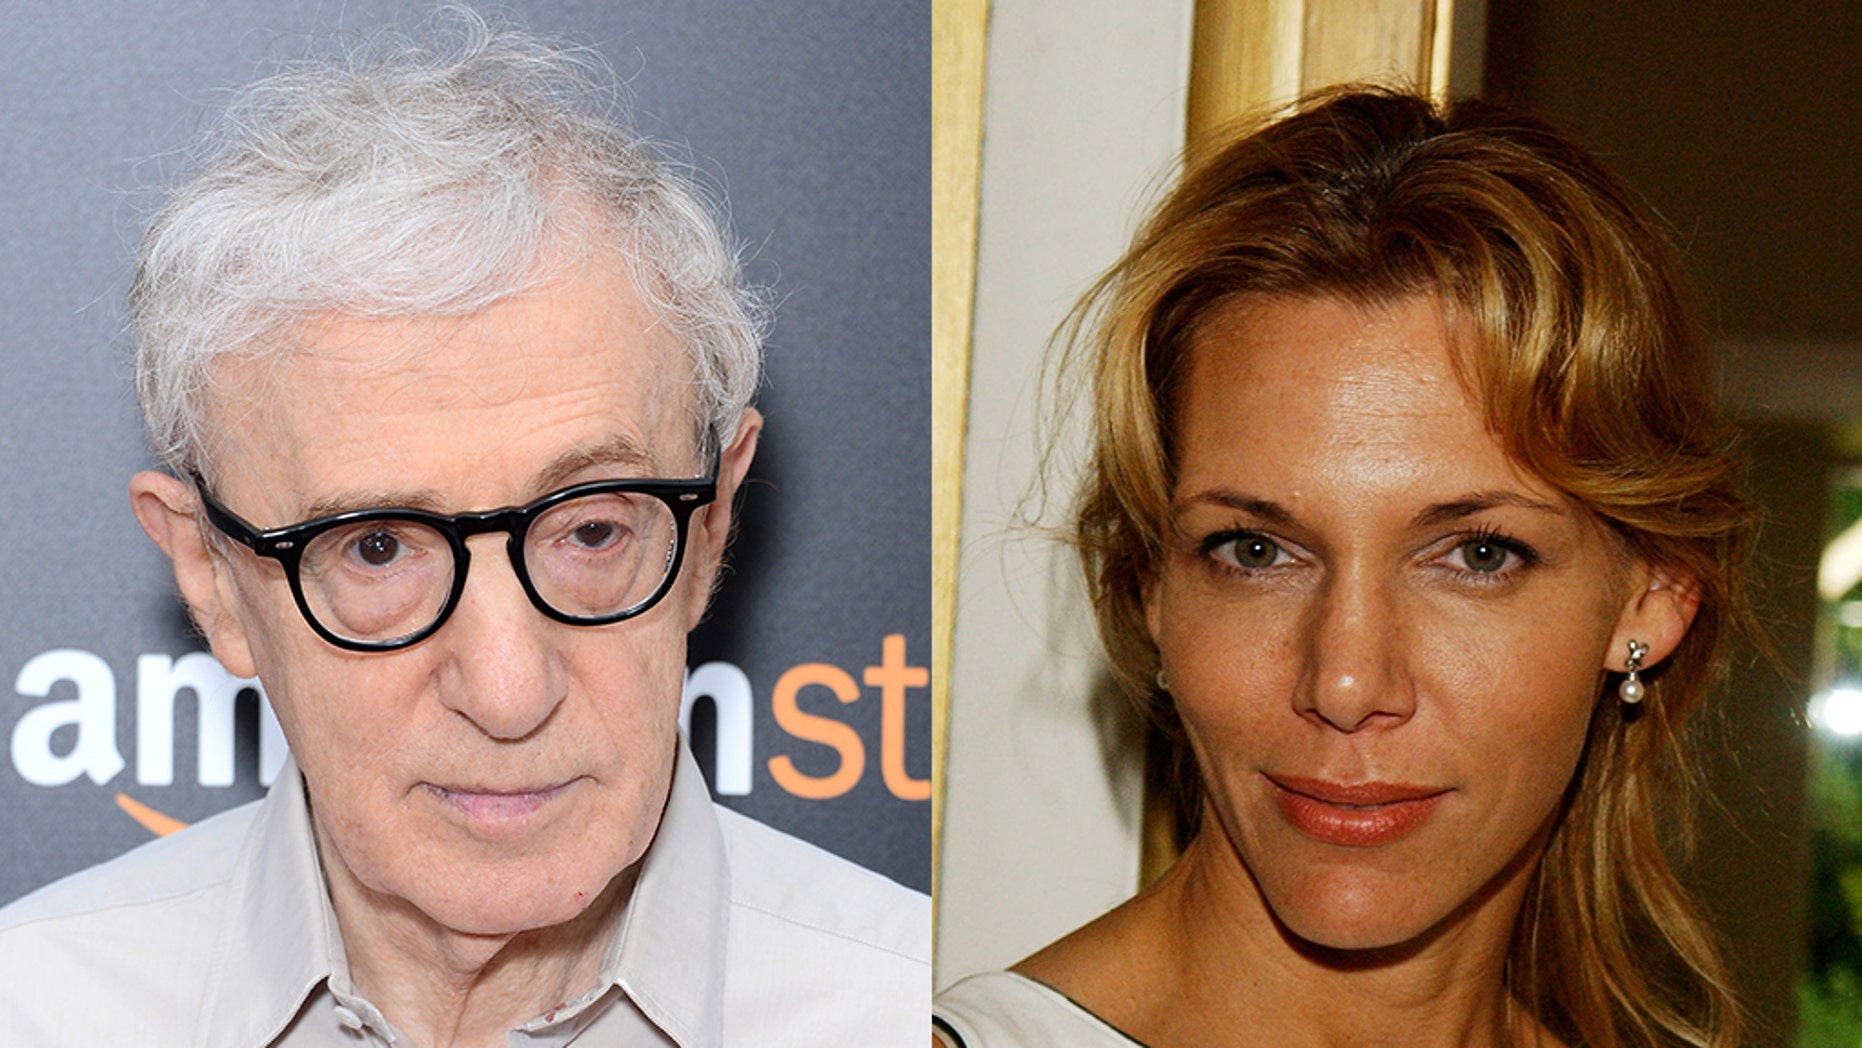 Babi Christina Engelhardt claimed she had an eight-year affair with Woody Allen. — Getty